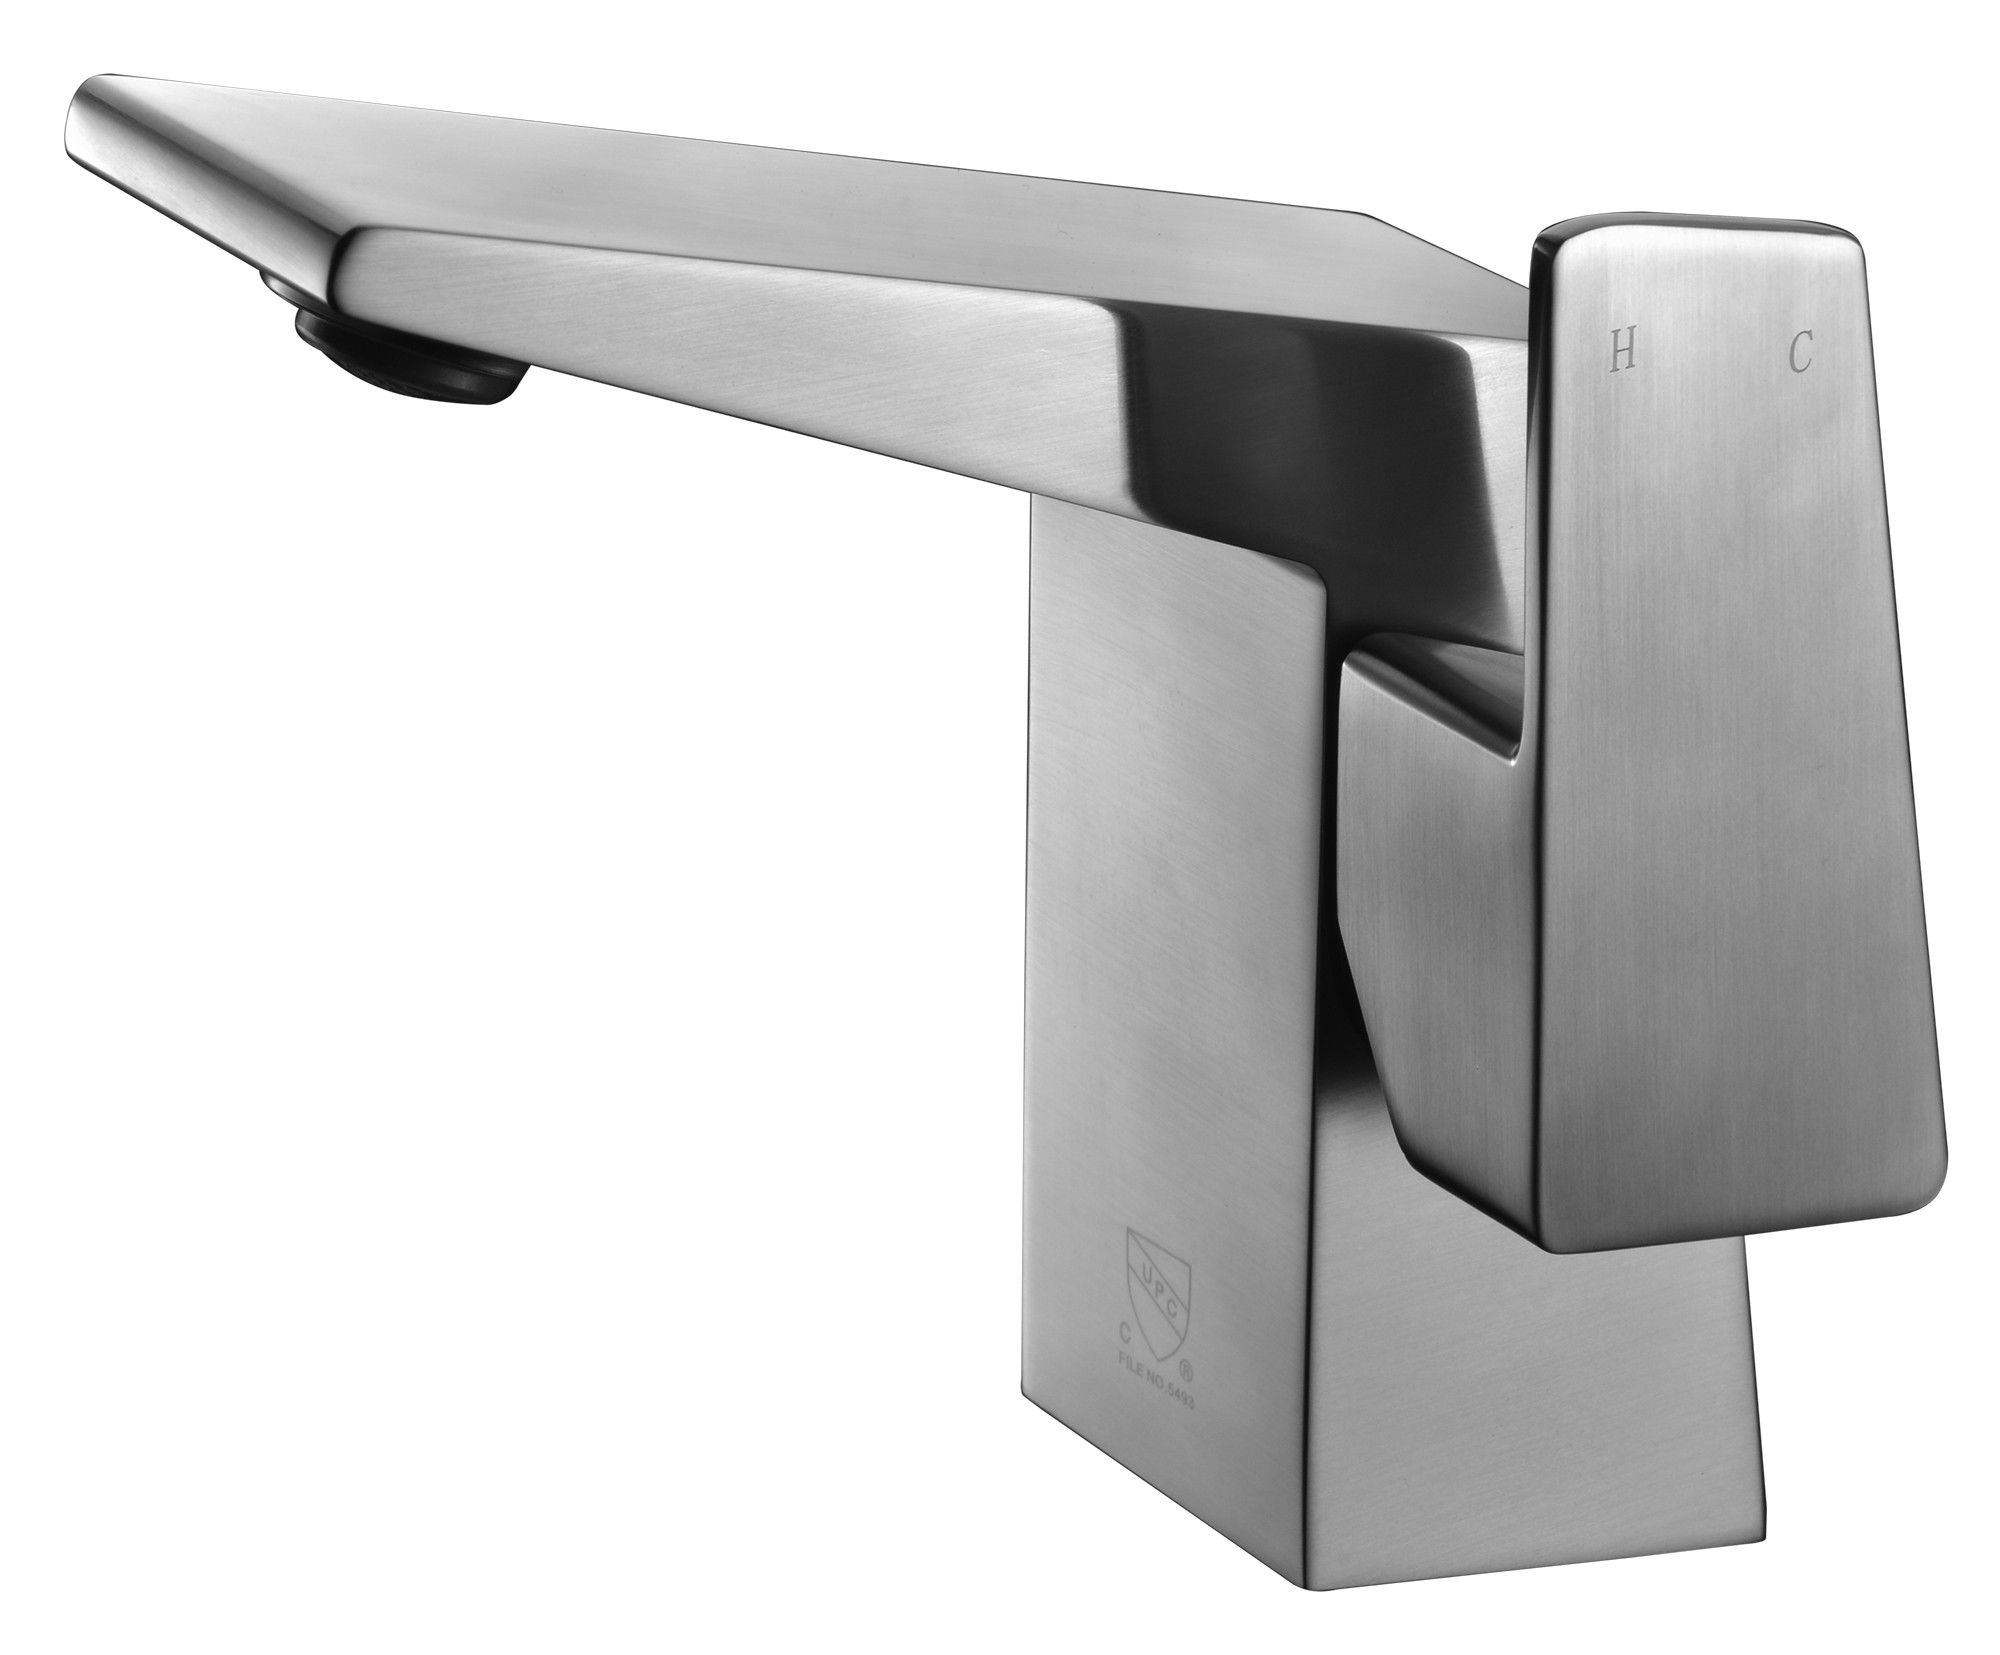 340 single hole bathroom faucets ideas